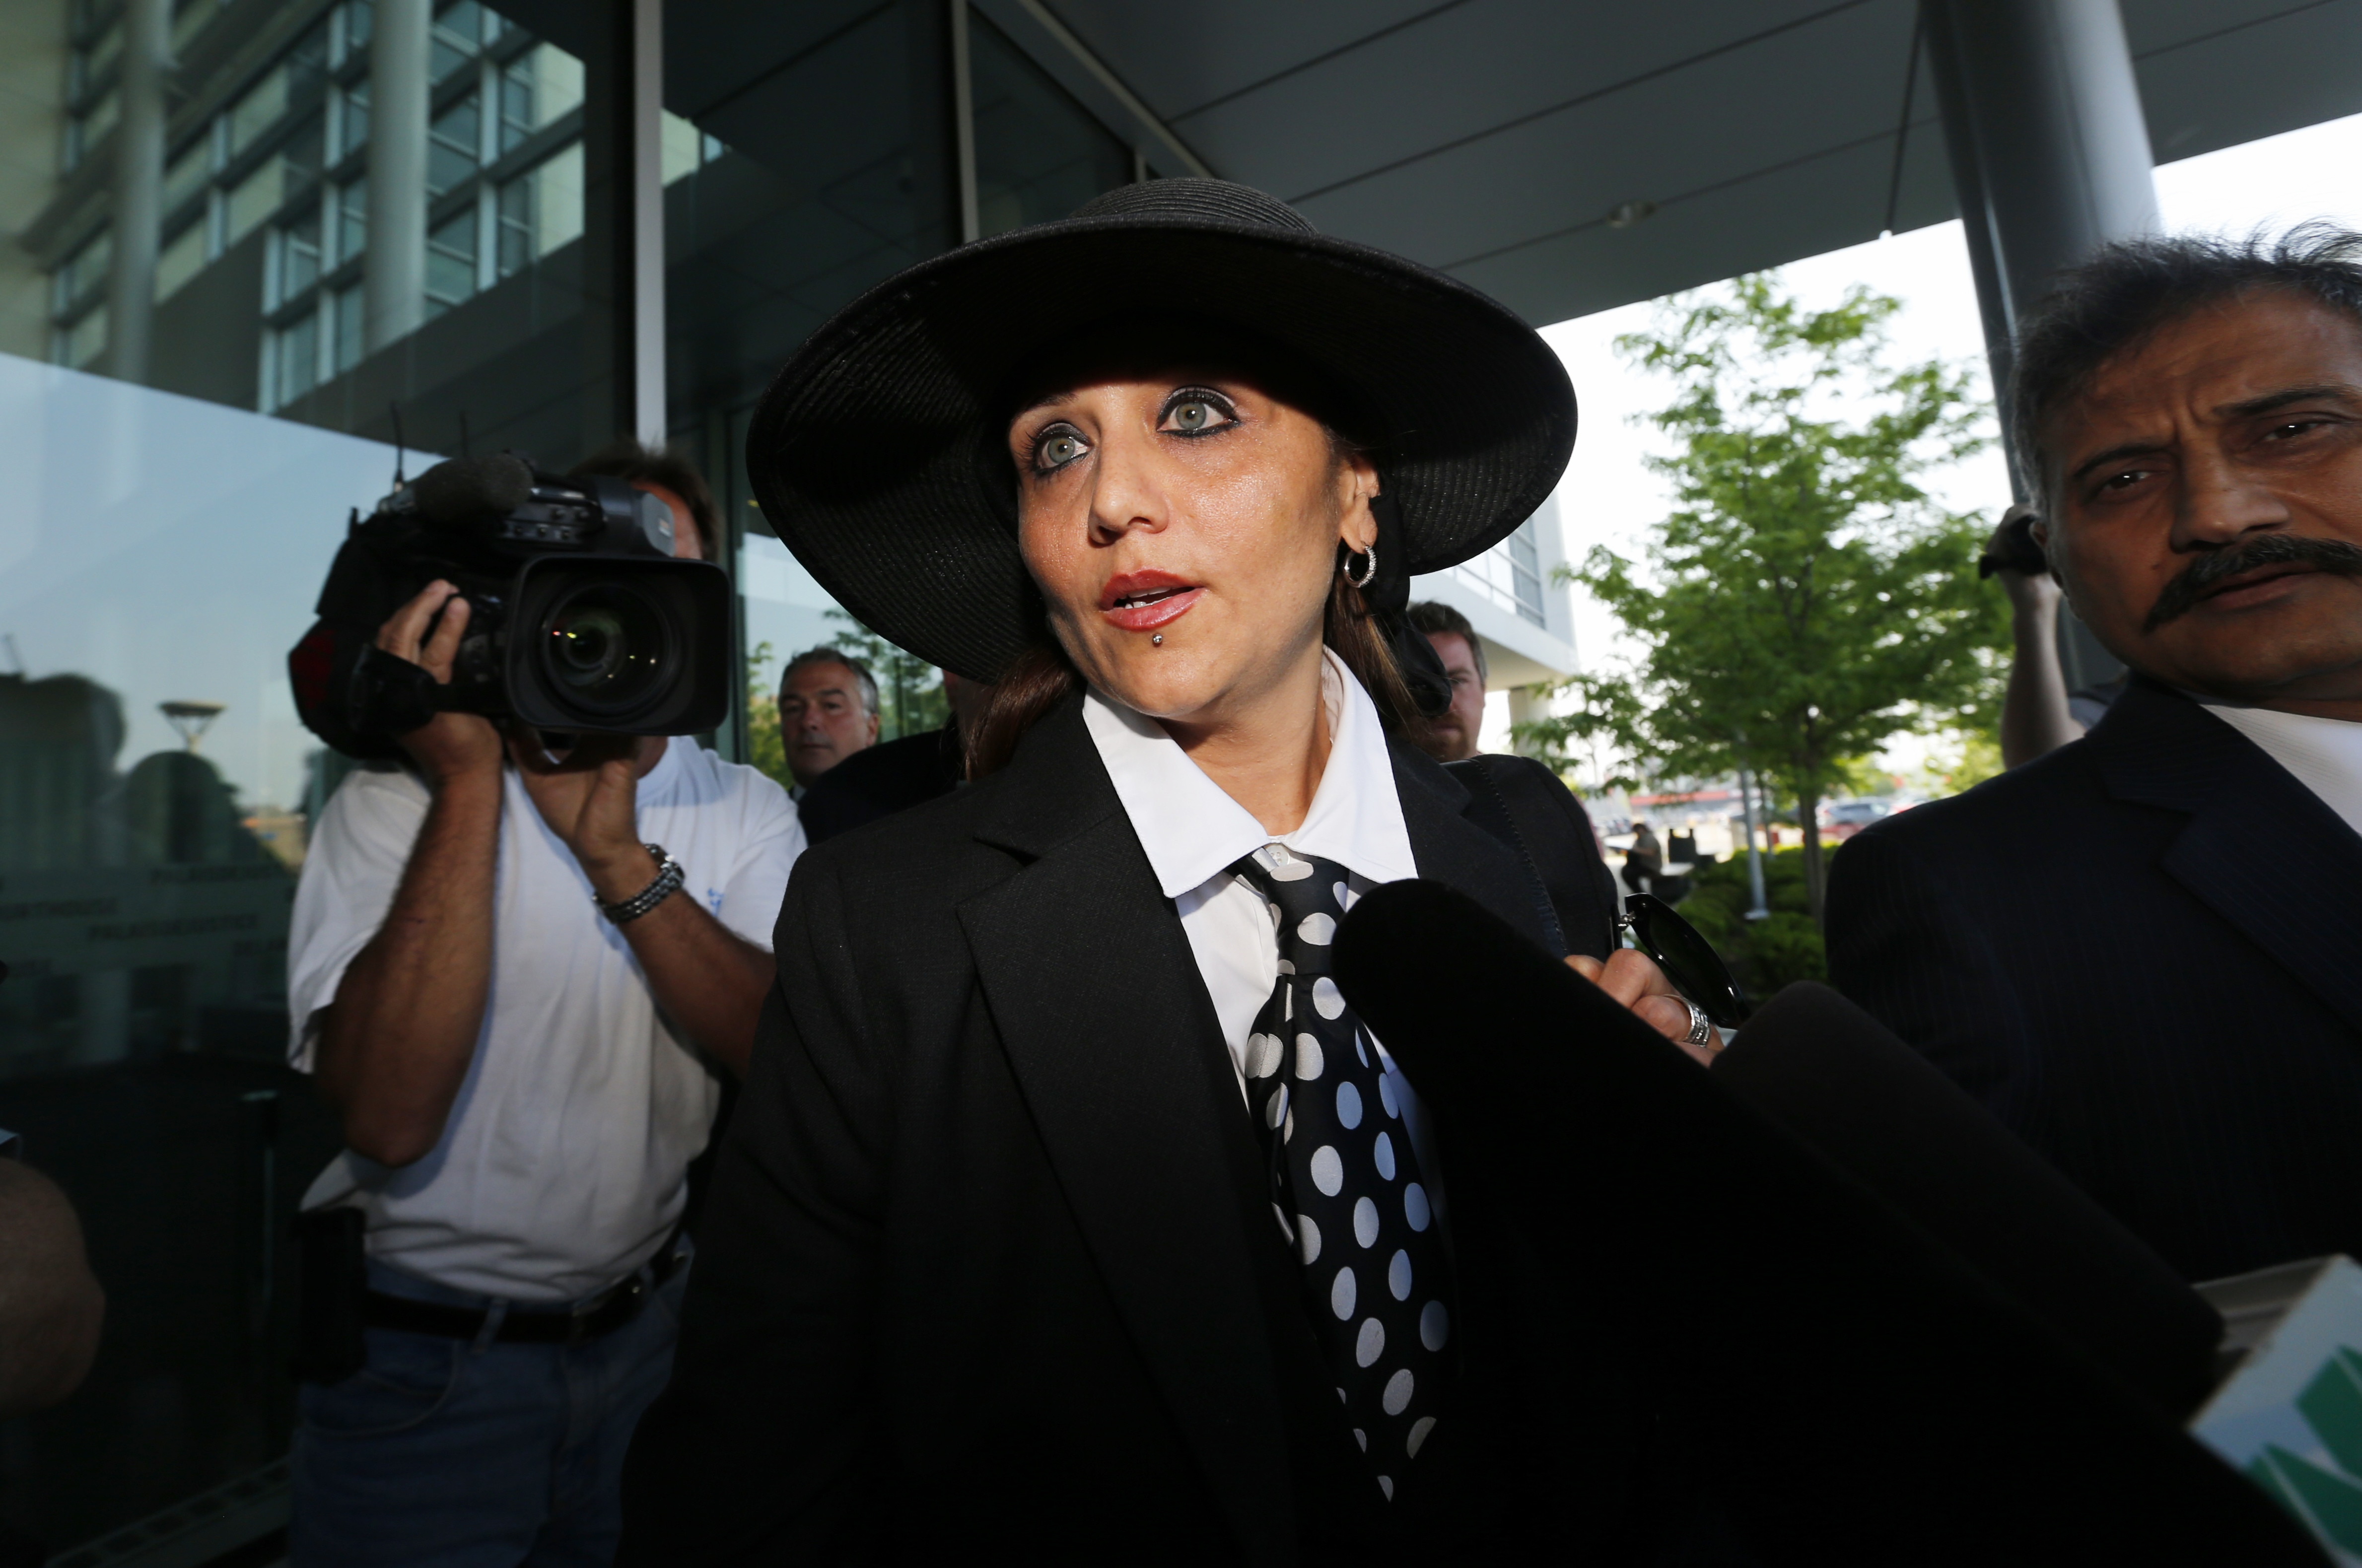 Yasmin Nakhuda in Oshawa, Canada, on May 30, 2013.